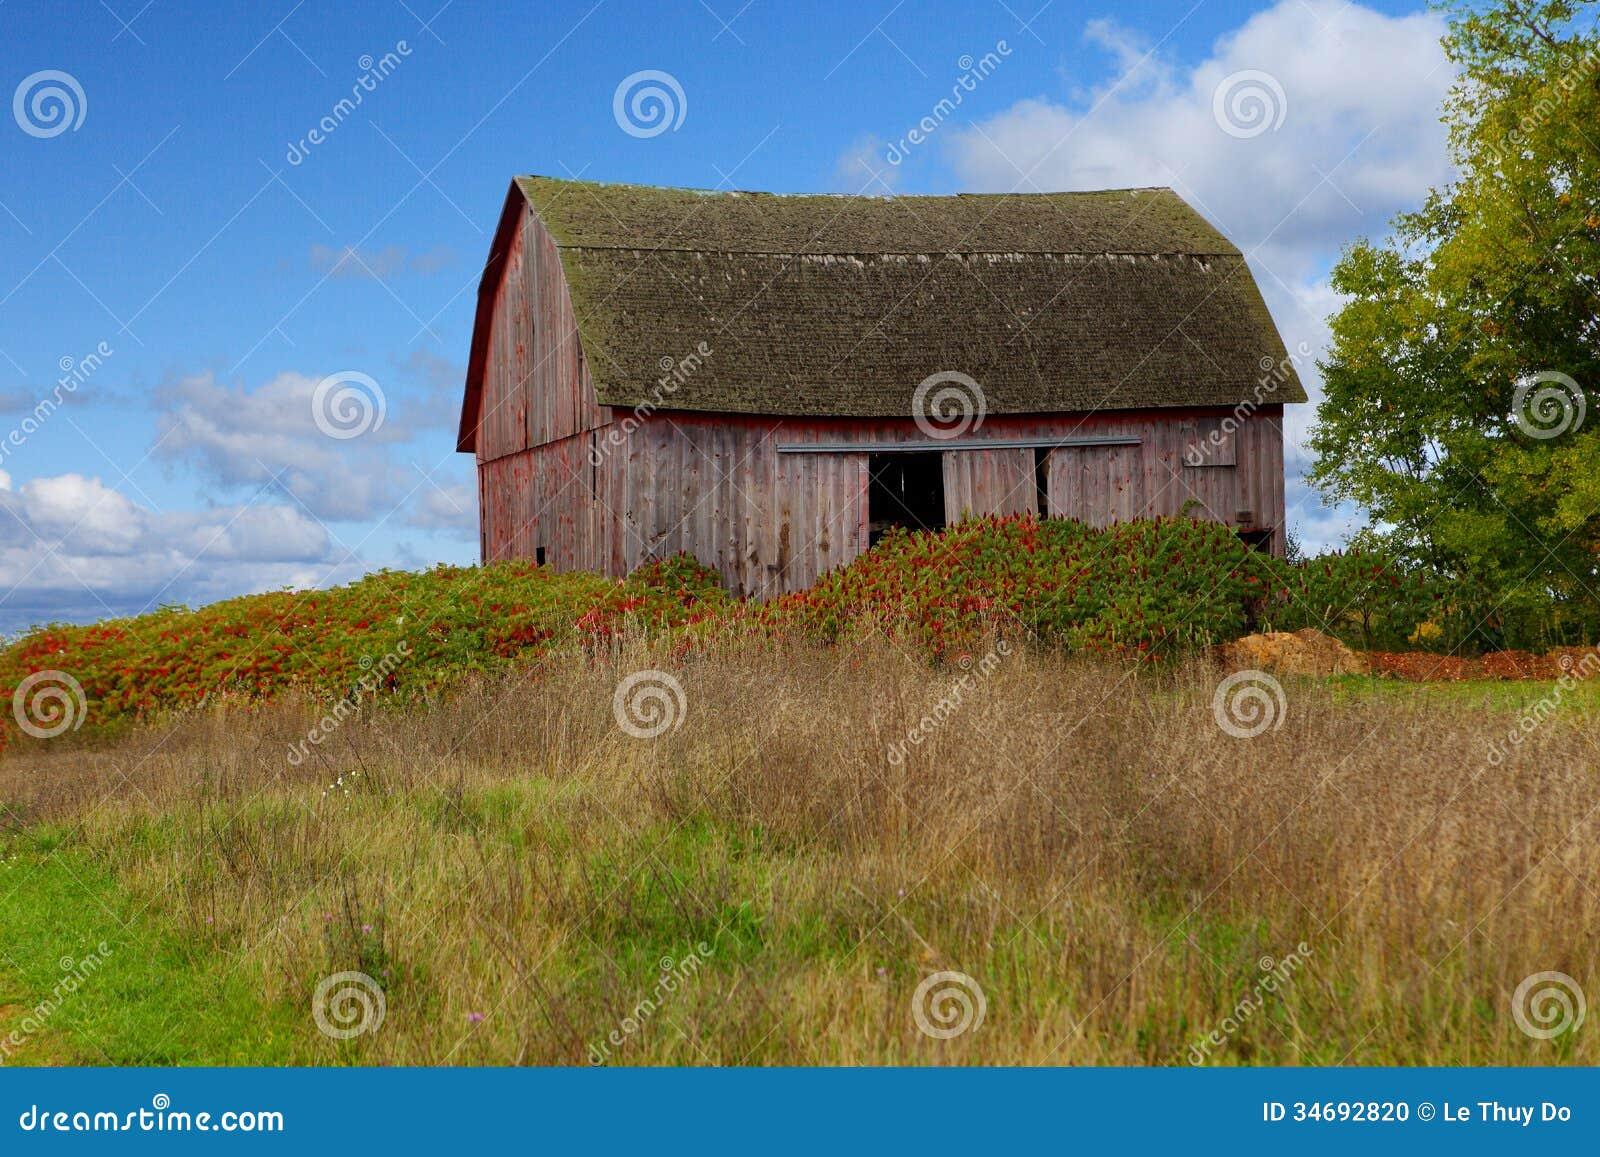 Peninsula Old Barn Stock Photo Image 34692820